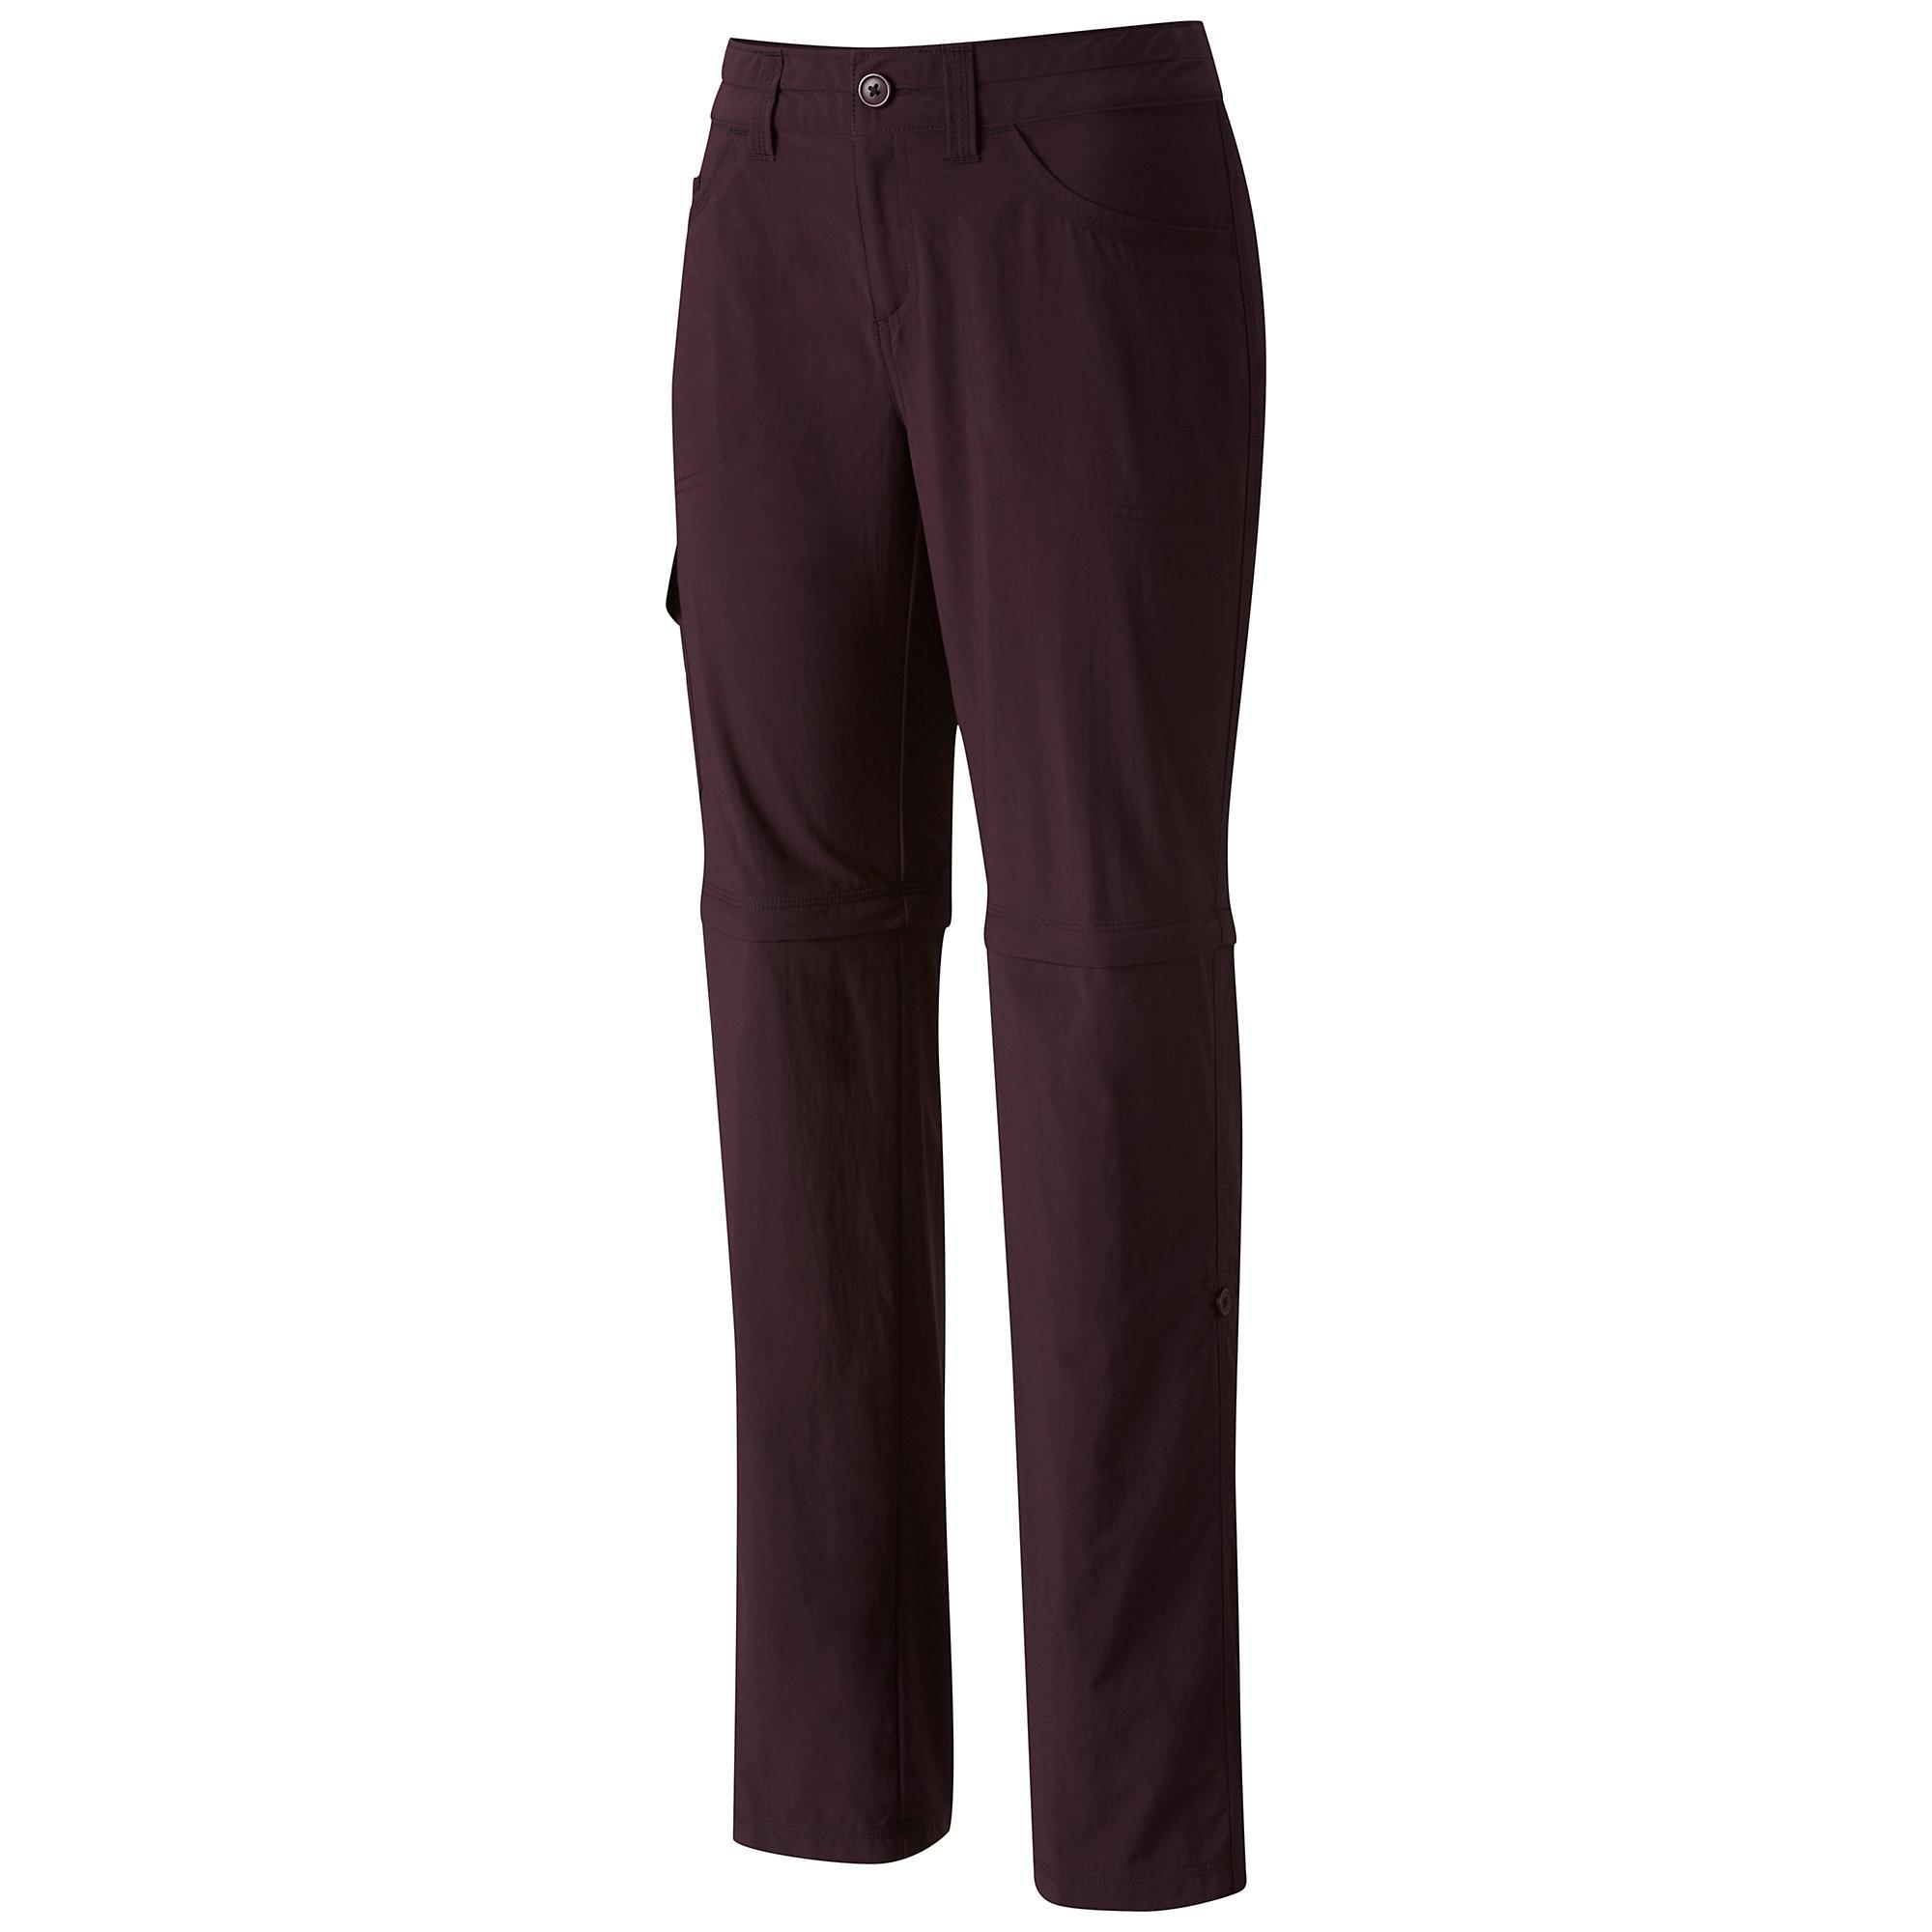 Mountain Hardwear Mirada Convertible Pant